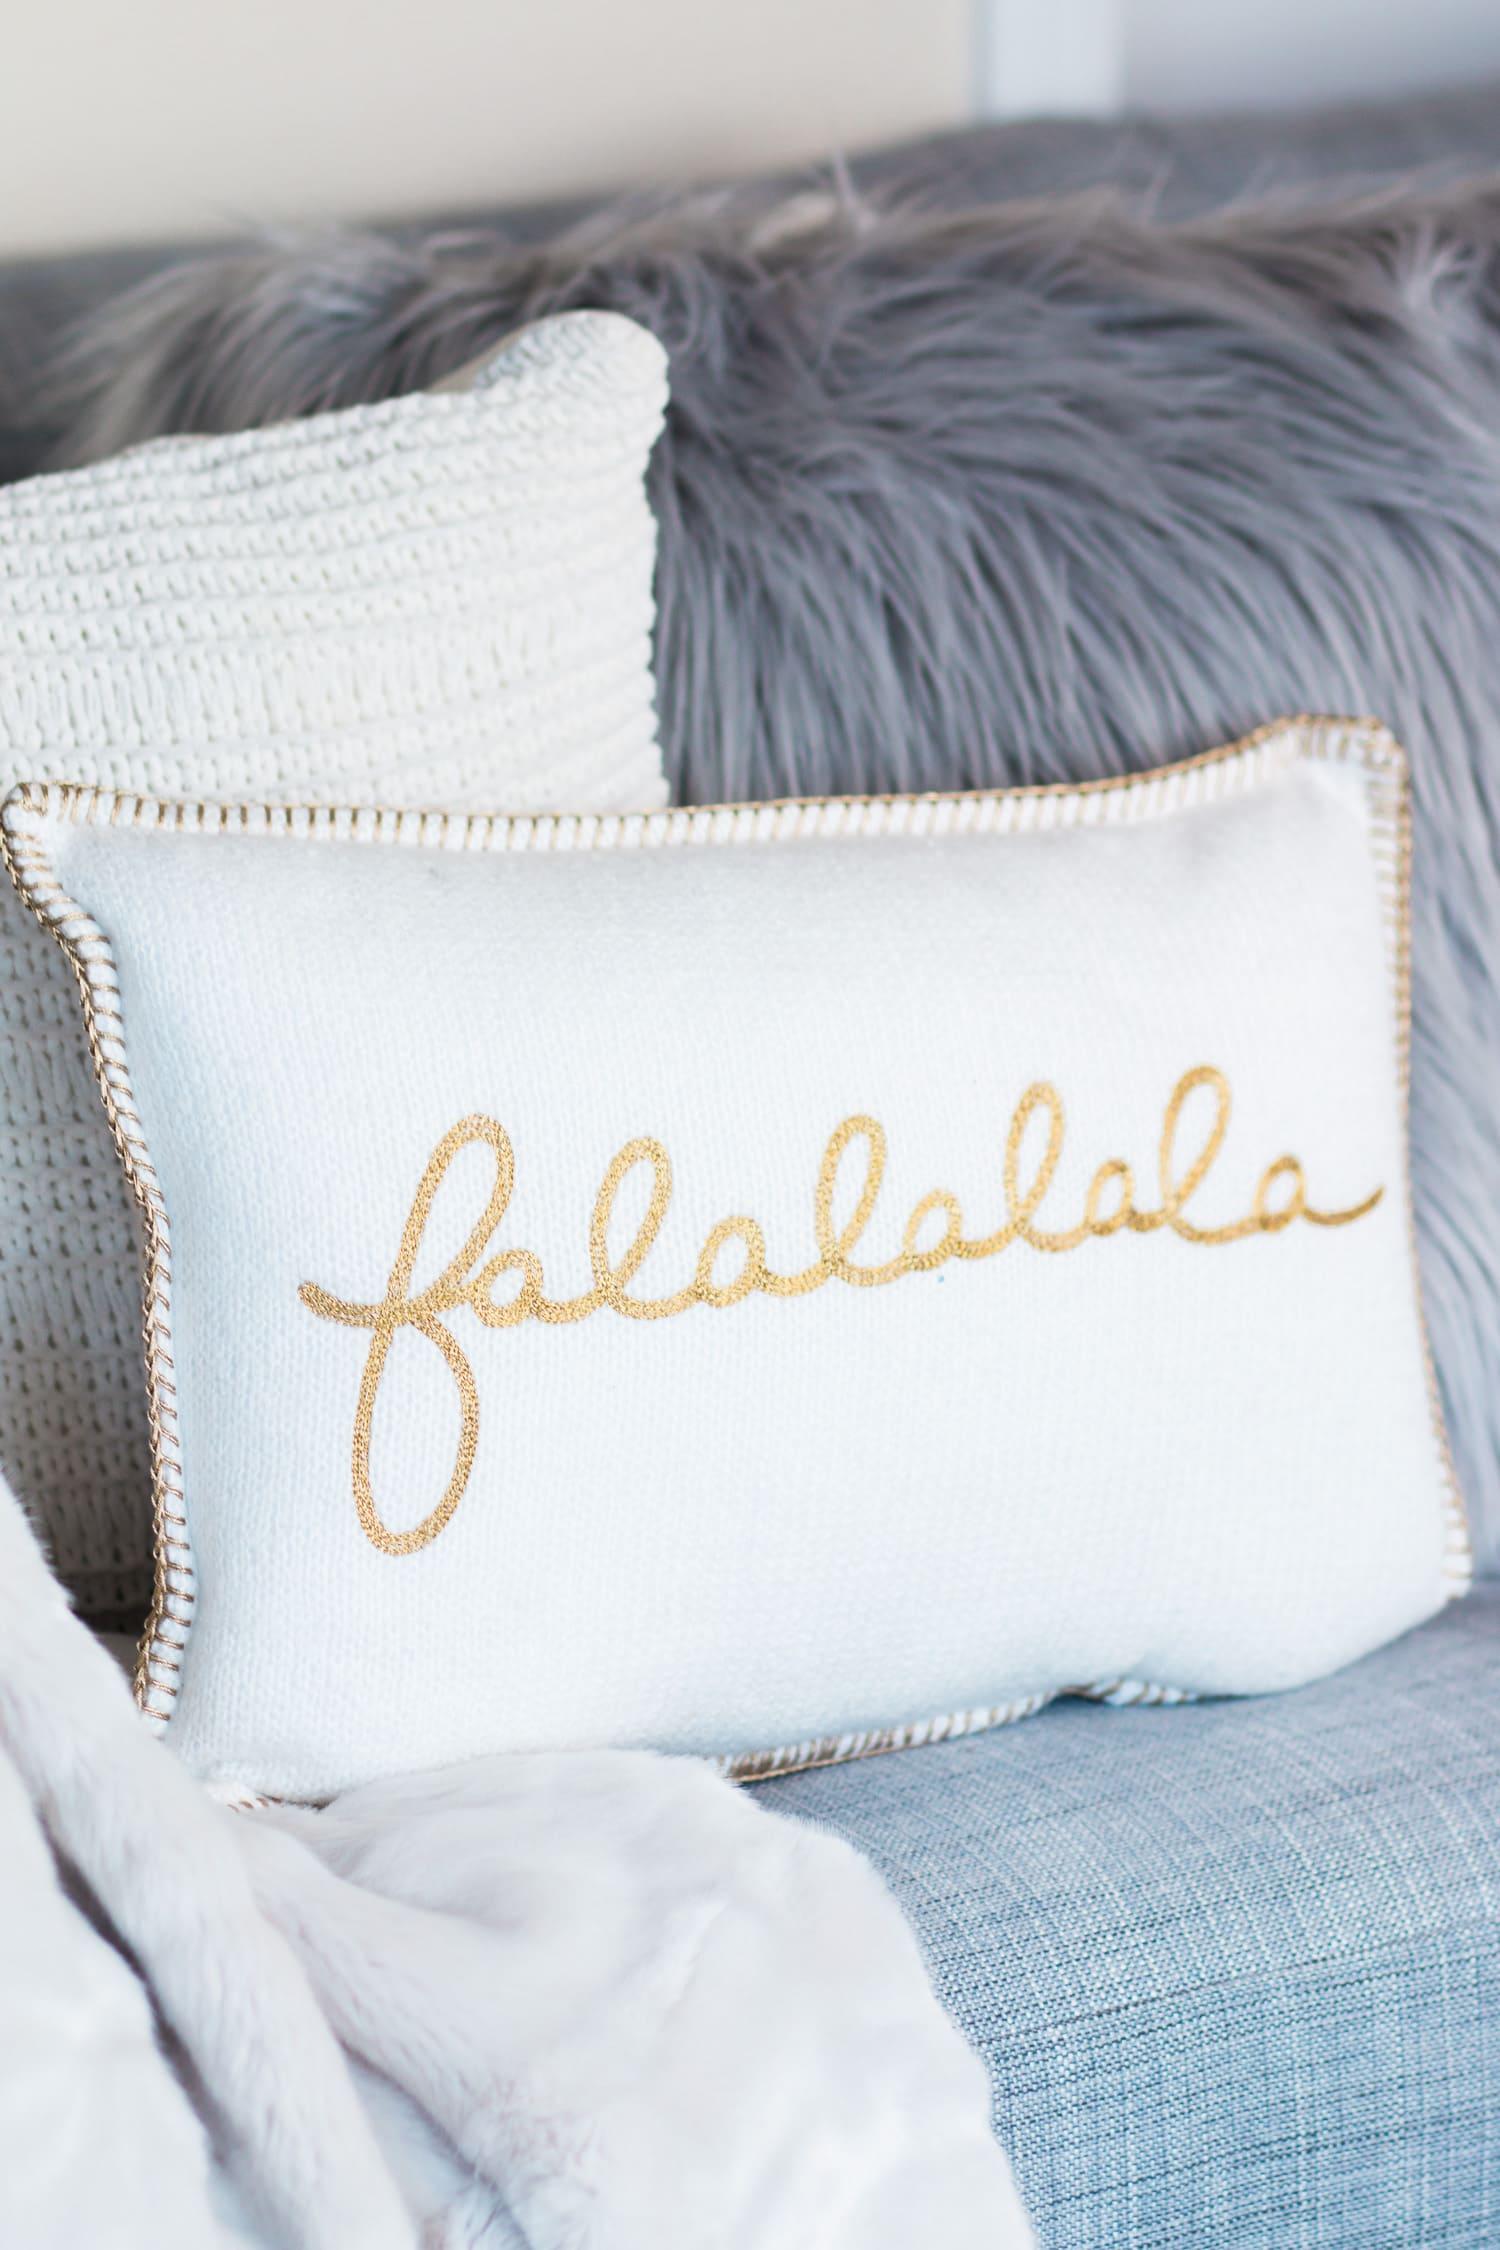 target-style-holiday-decor-falalalala-christmas-pillow-6673